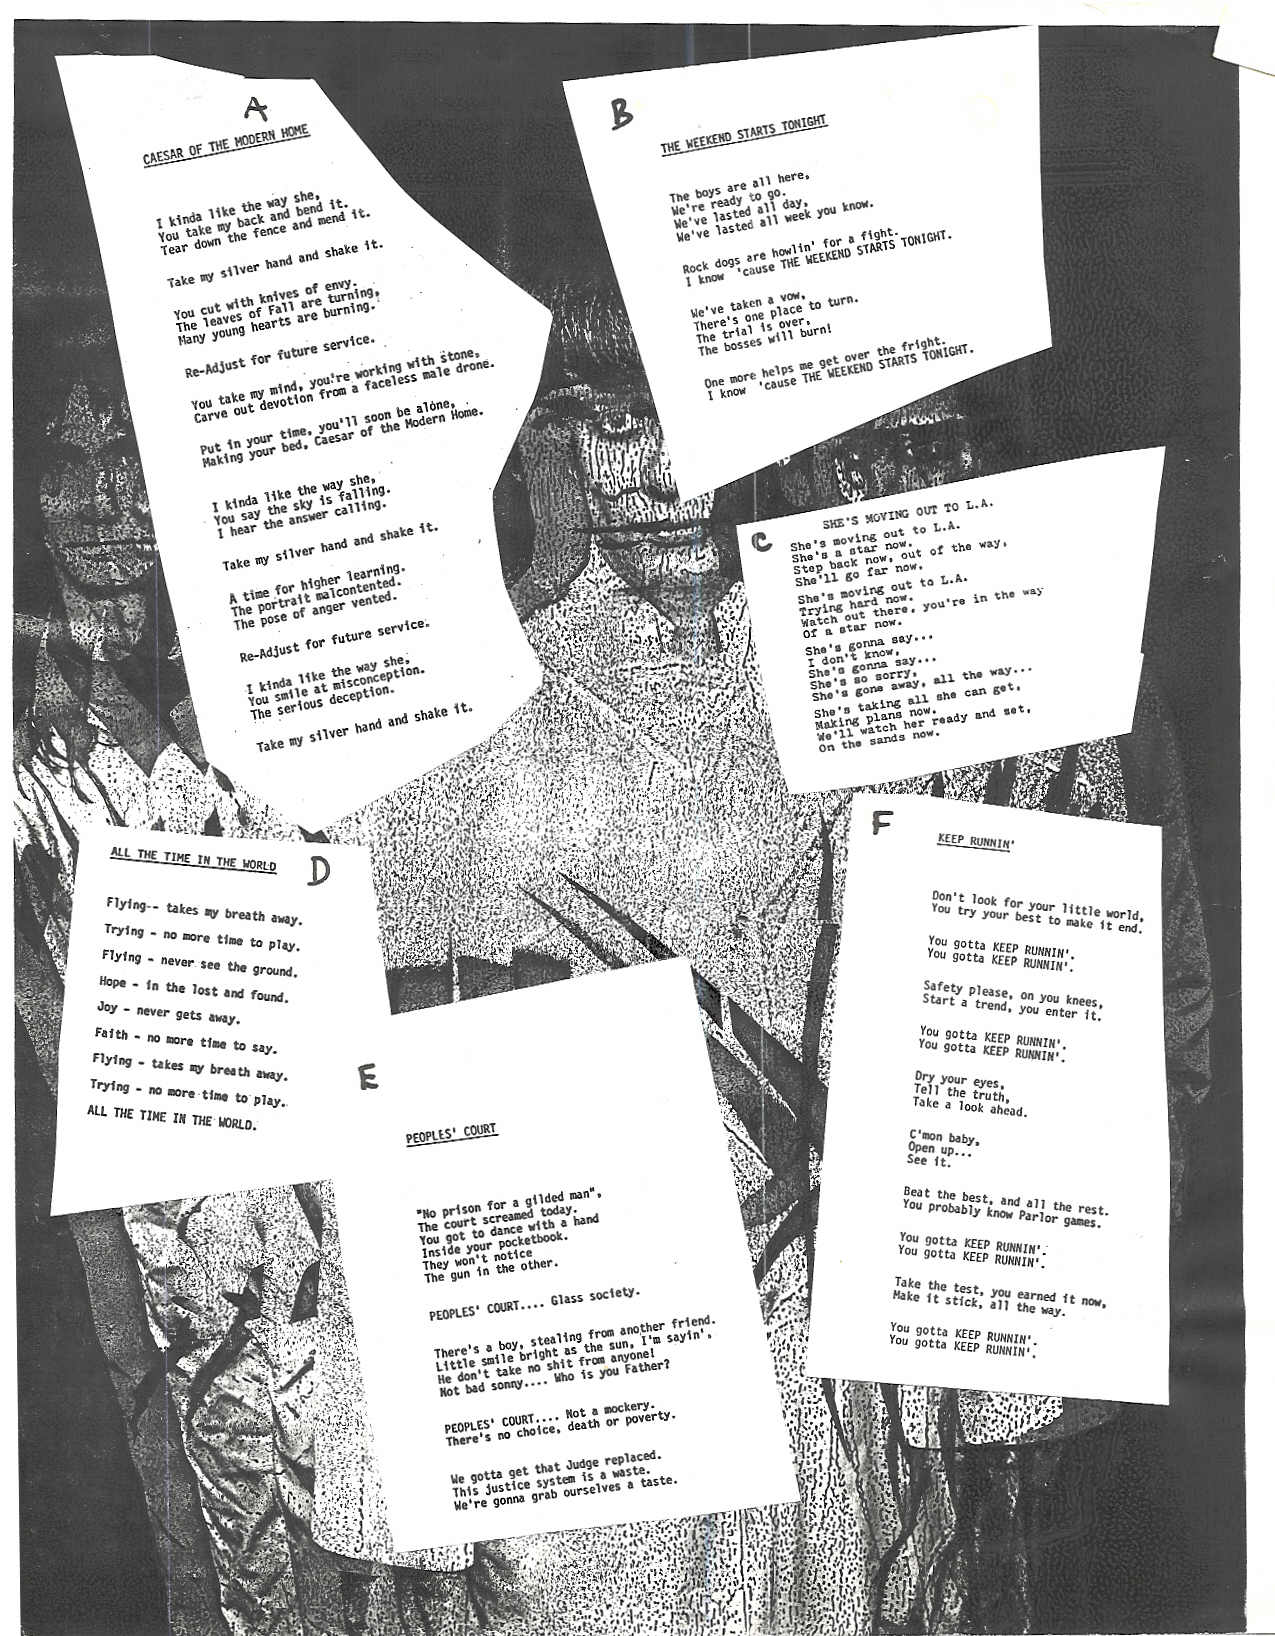 Lyric Sheet - The Loft Studio Recordings, Parousia